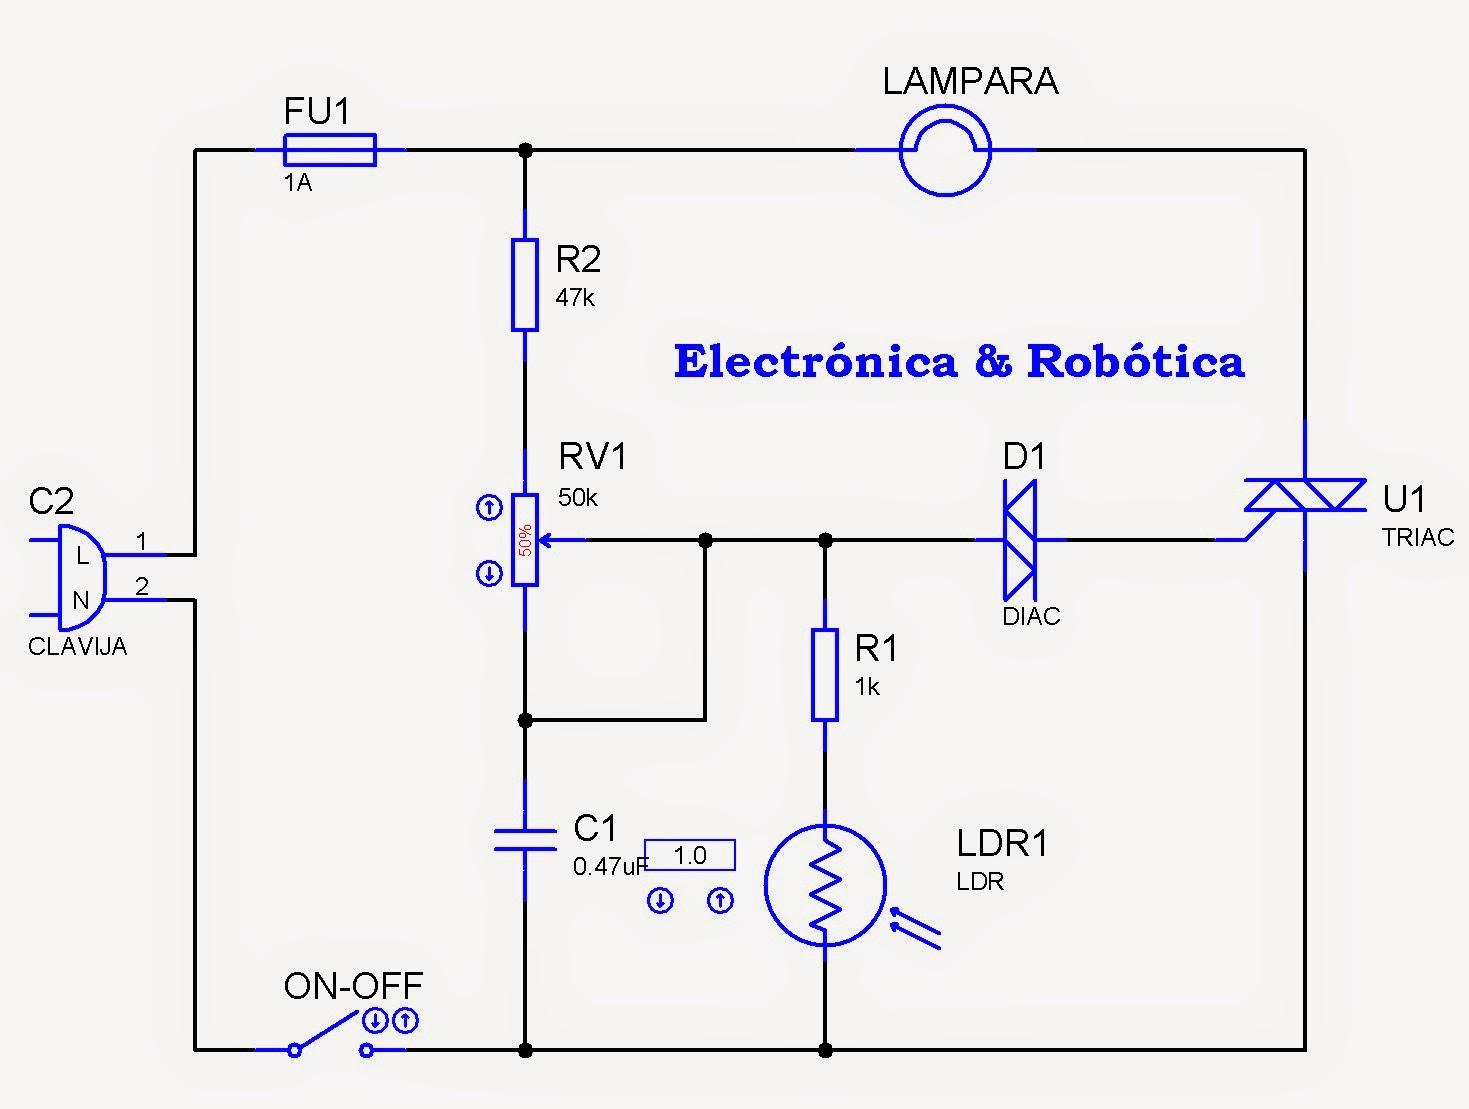 Circuito Ldr Con Potenciometro Tresdeland Tu Mundo D Control De Sensor Luz Com Te1 E R By Mrchunckuee Fotoelctrico Nocturna